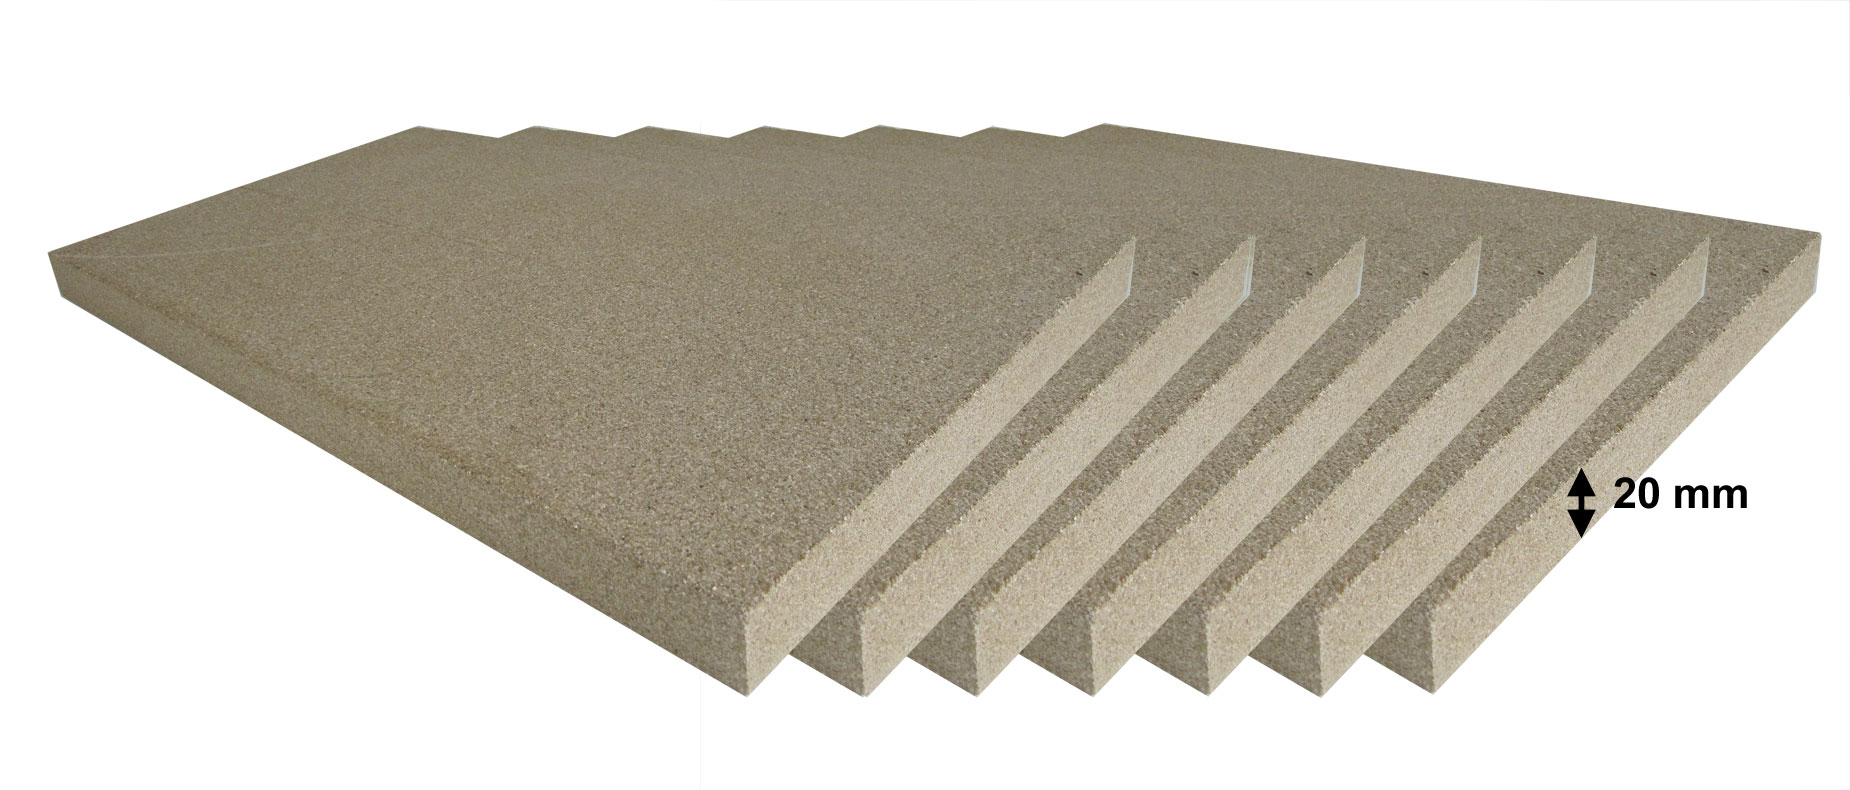 Vermiculite Platten Reparatur Set 7 Stück 500x300x20 mm Bild 1